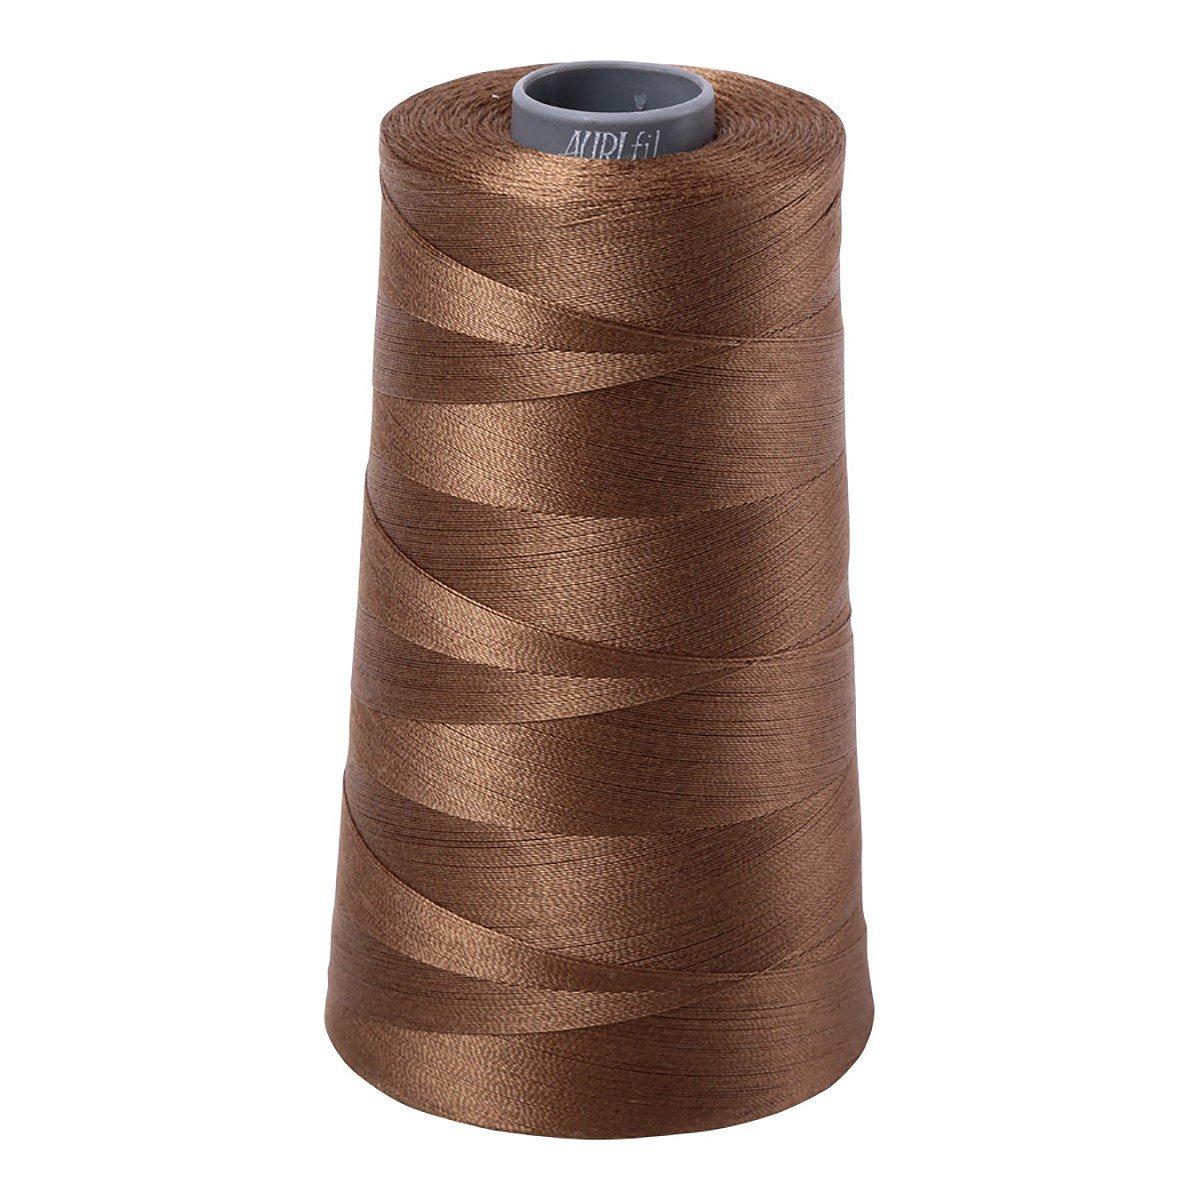 Mako (Cotton) Embroidery Thread 28wt 3609yds Dark Sandstone